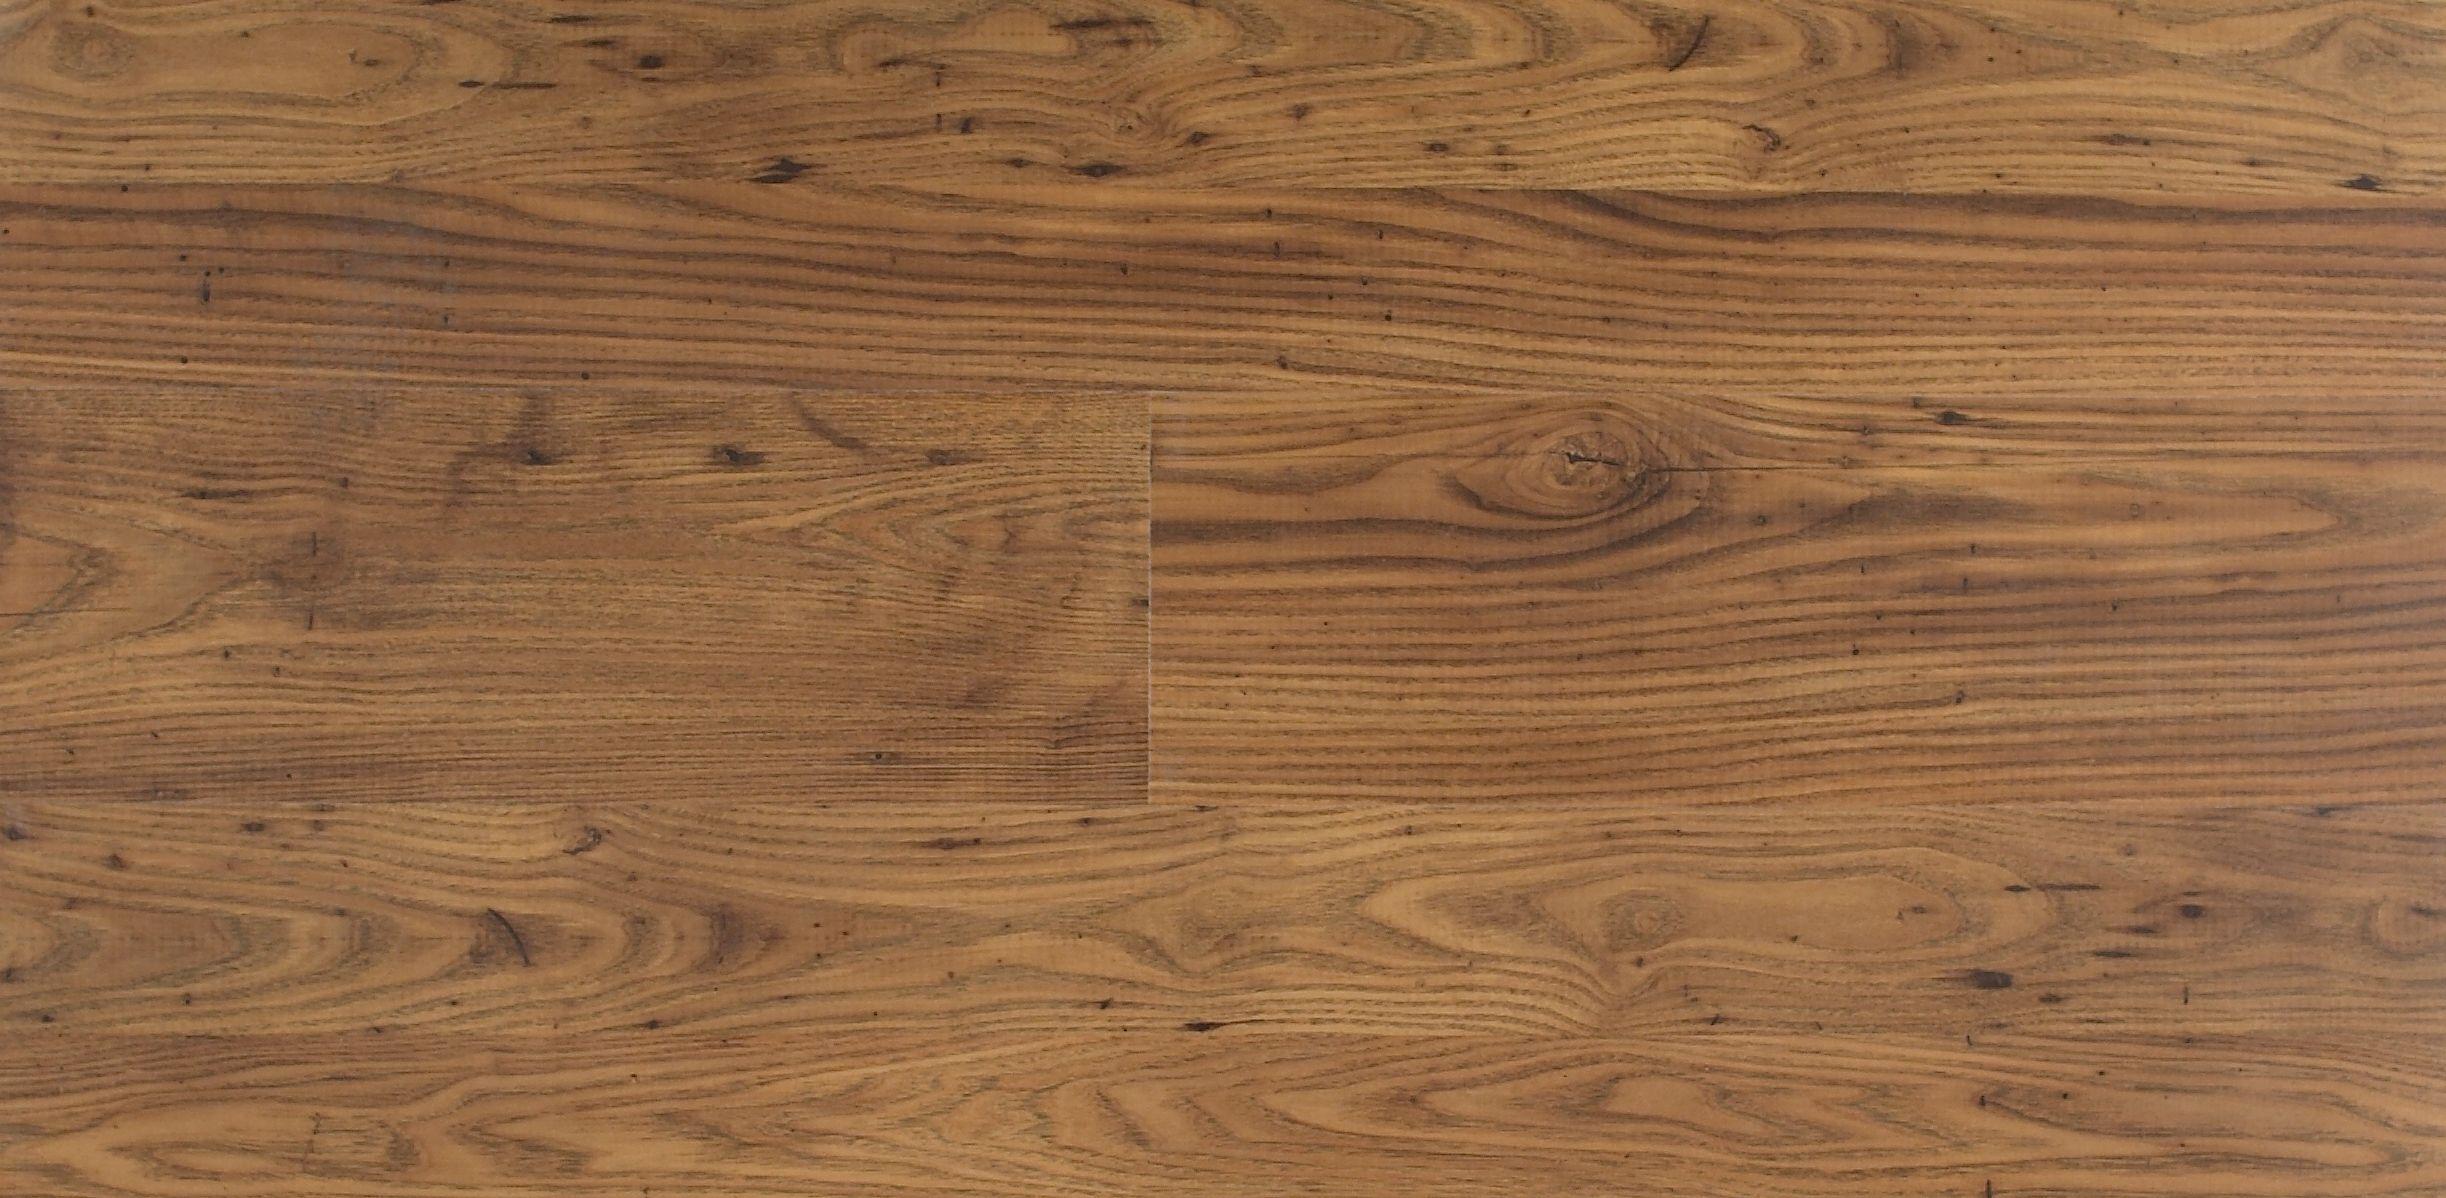 wood texture - Tìm với Google | wood map | Pinterest | Mood boards ...